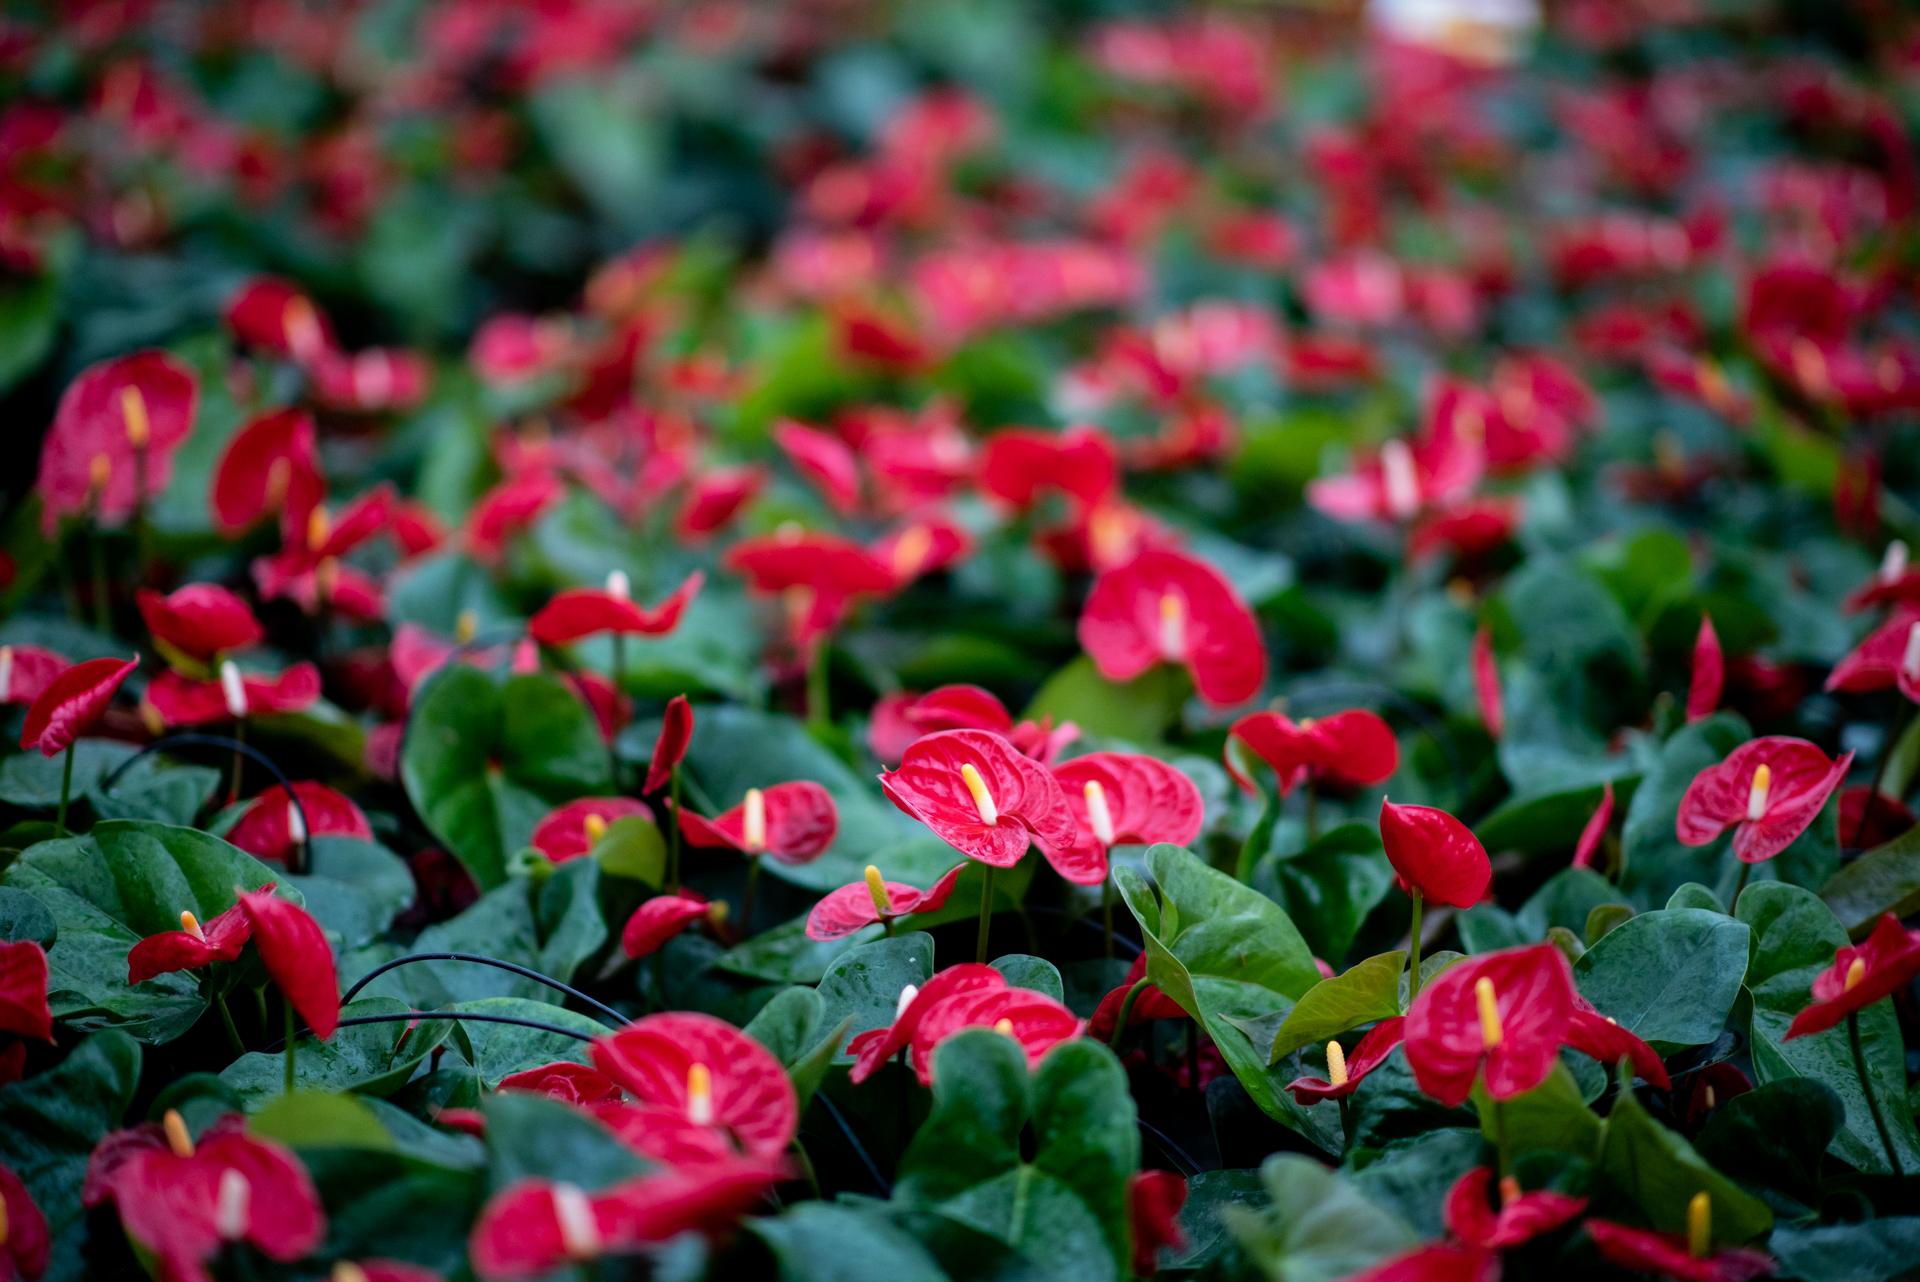 Piante Eleganti Da Appartamento anthurium: una delle piante da appartamento più amate di sempre